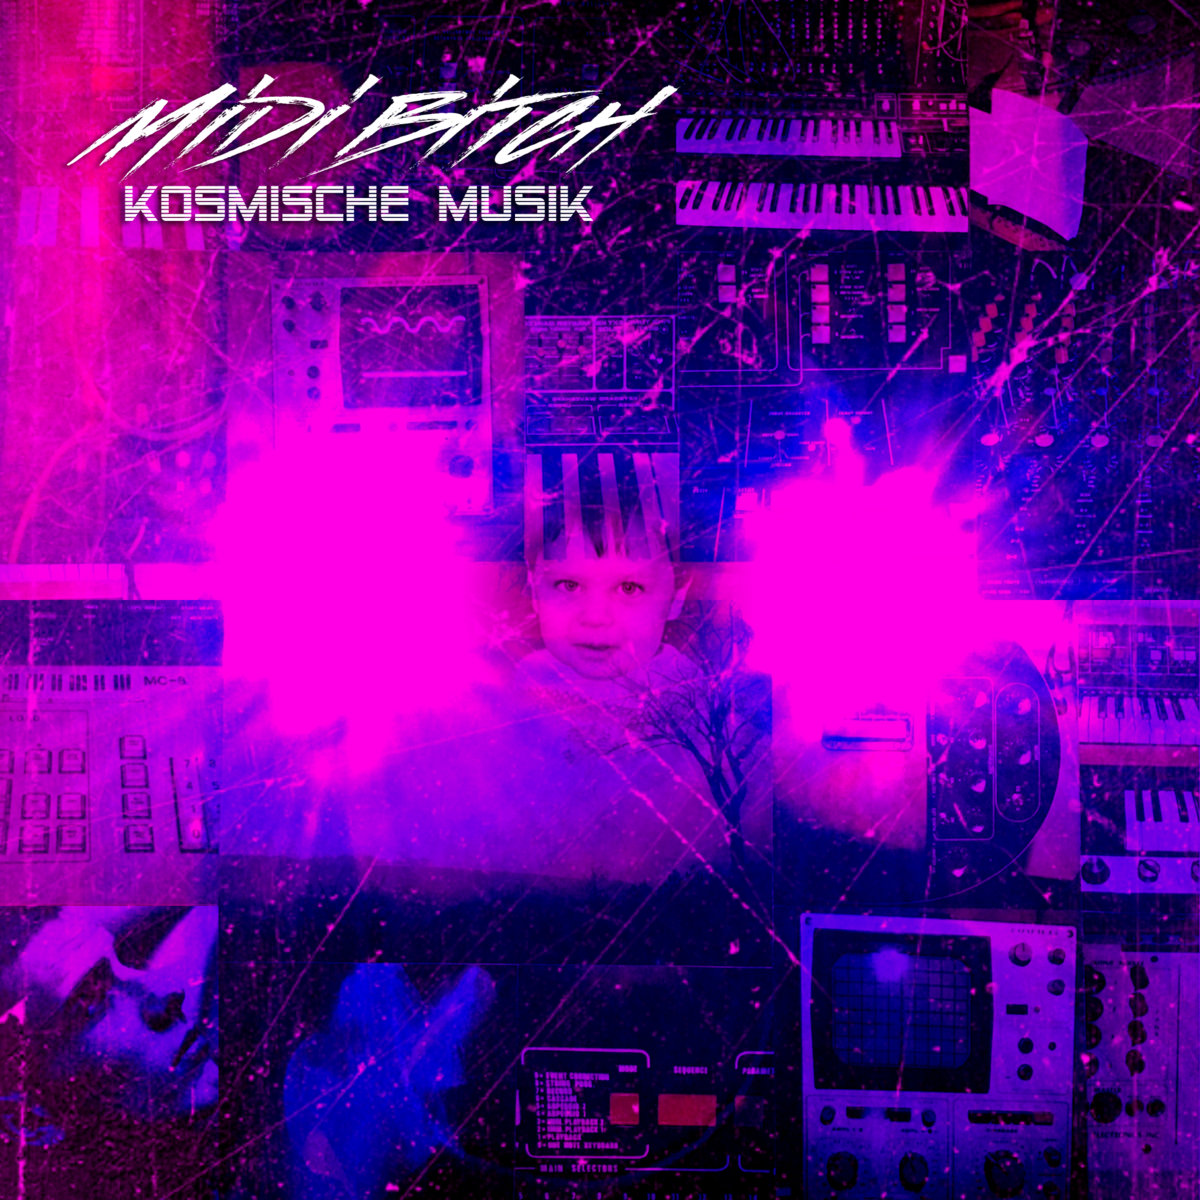 M!D! B!TCH - KOSMISCHE MUSIK 1